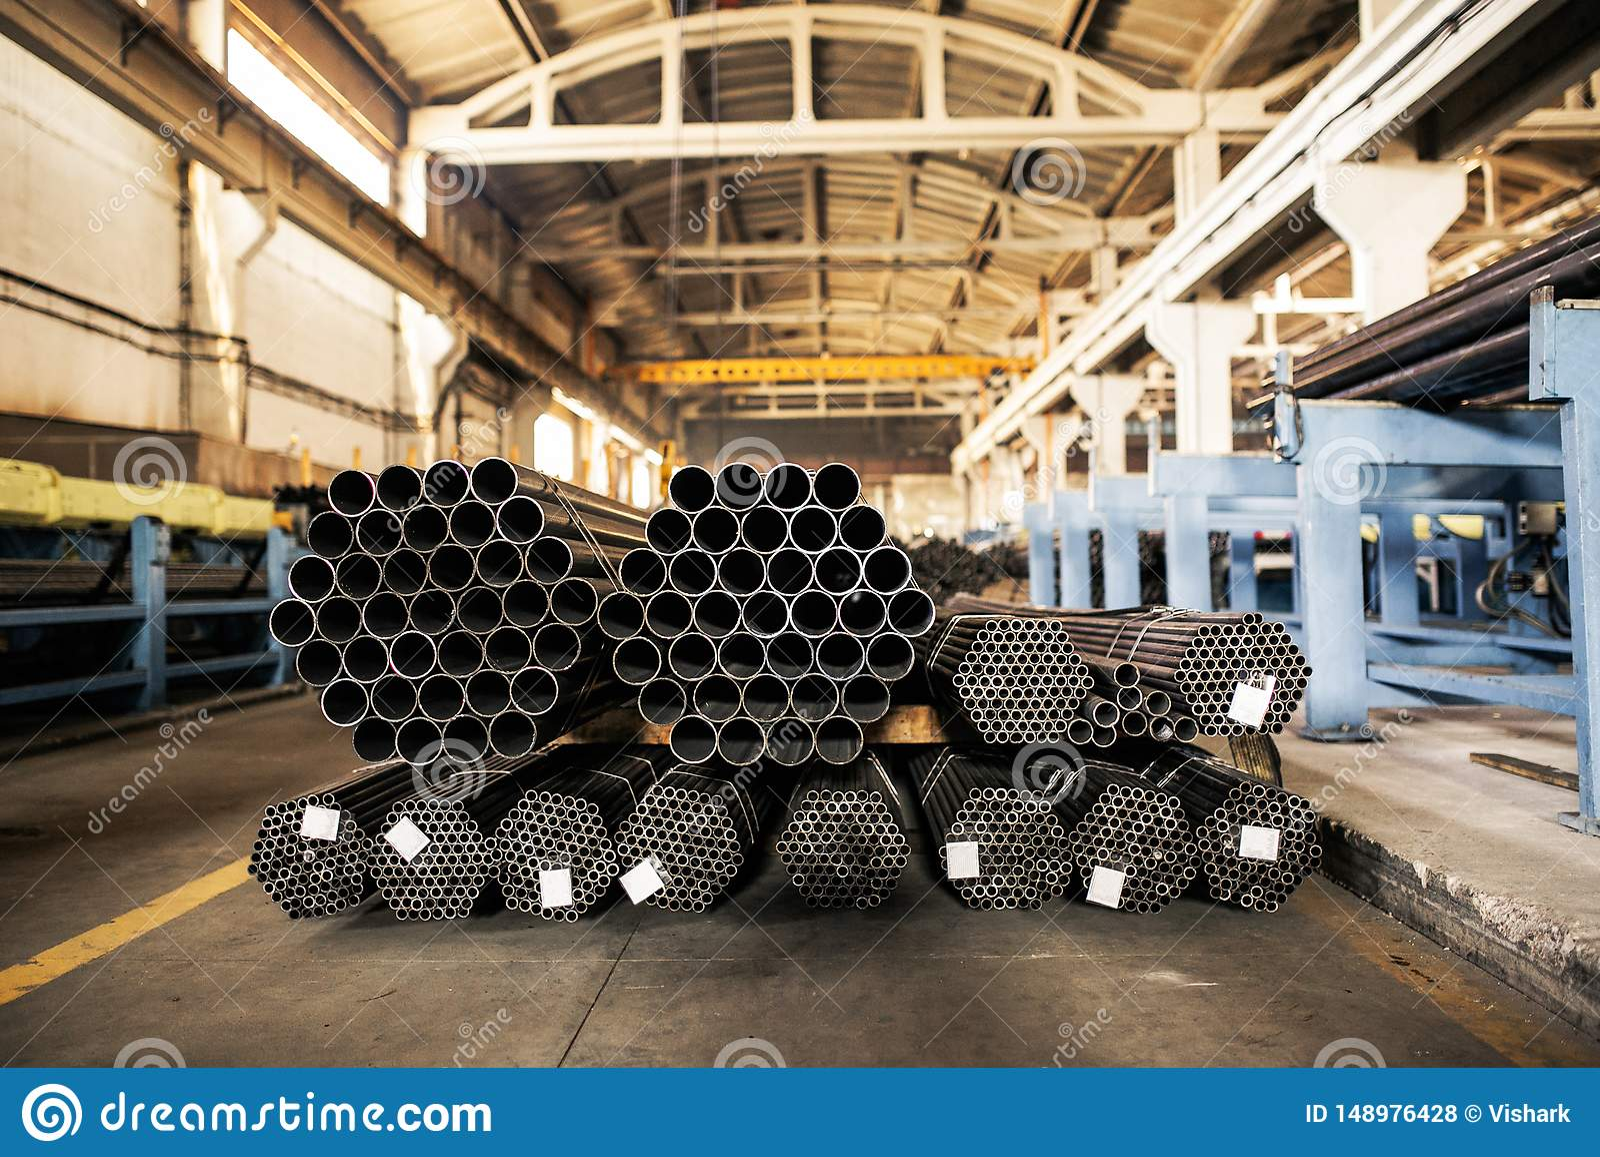 Metallic pipes on warehouse, rows of metal pipes on industrial warehouse. Industrial interior,